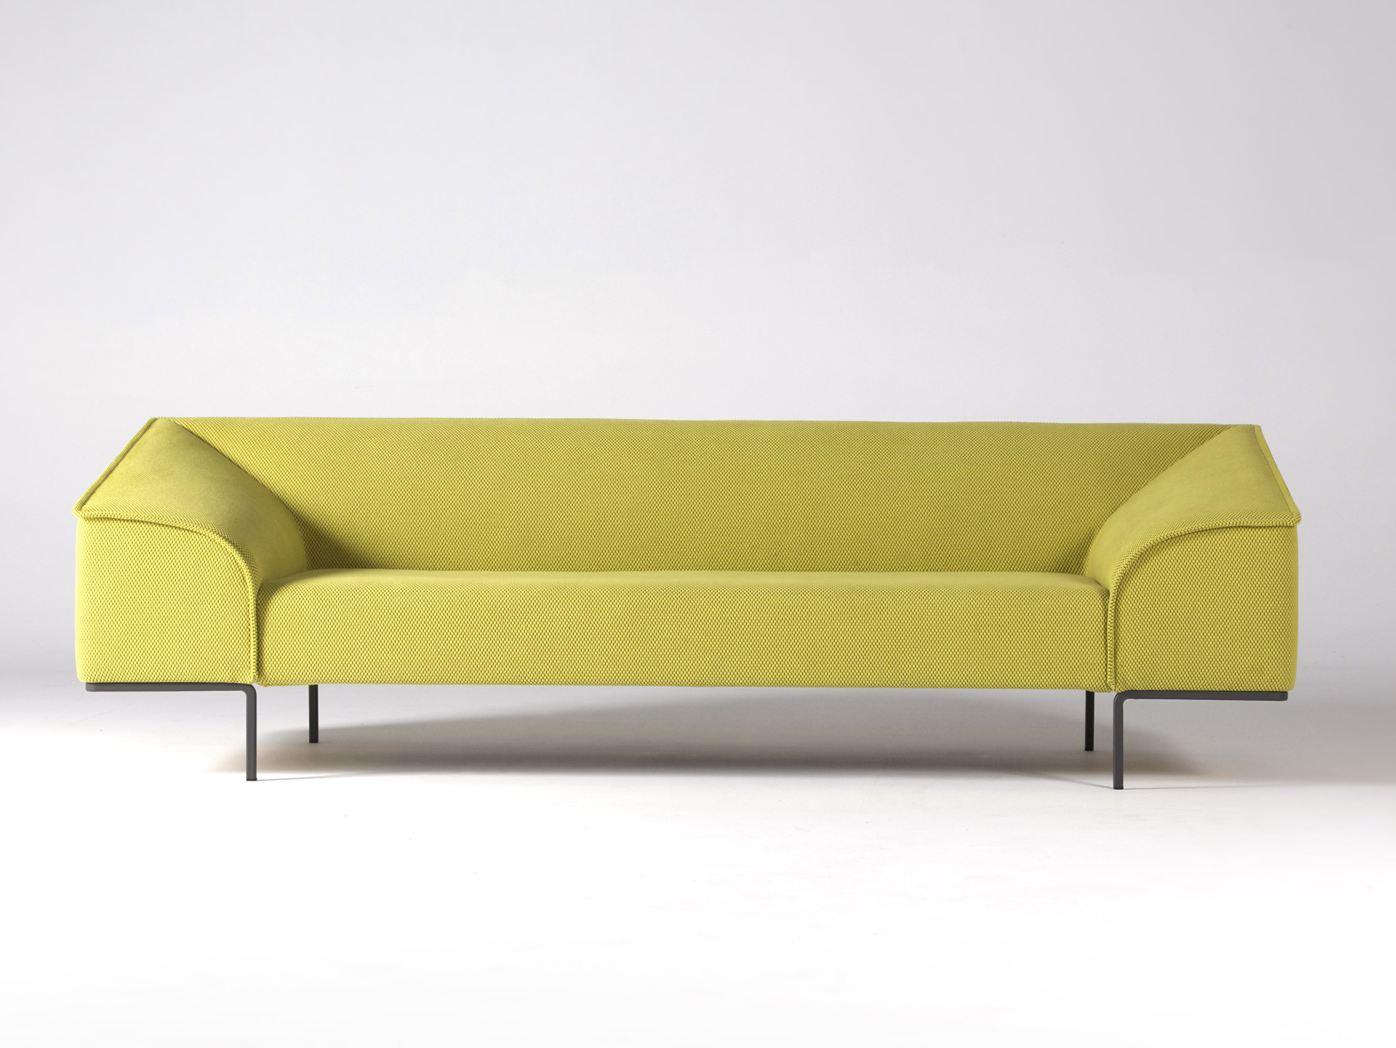 Lipp armchair by piero lissoni for living divani sohomod for Prostoria divani